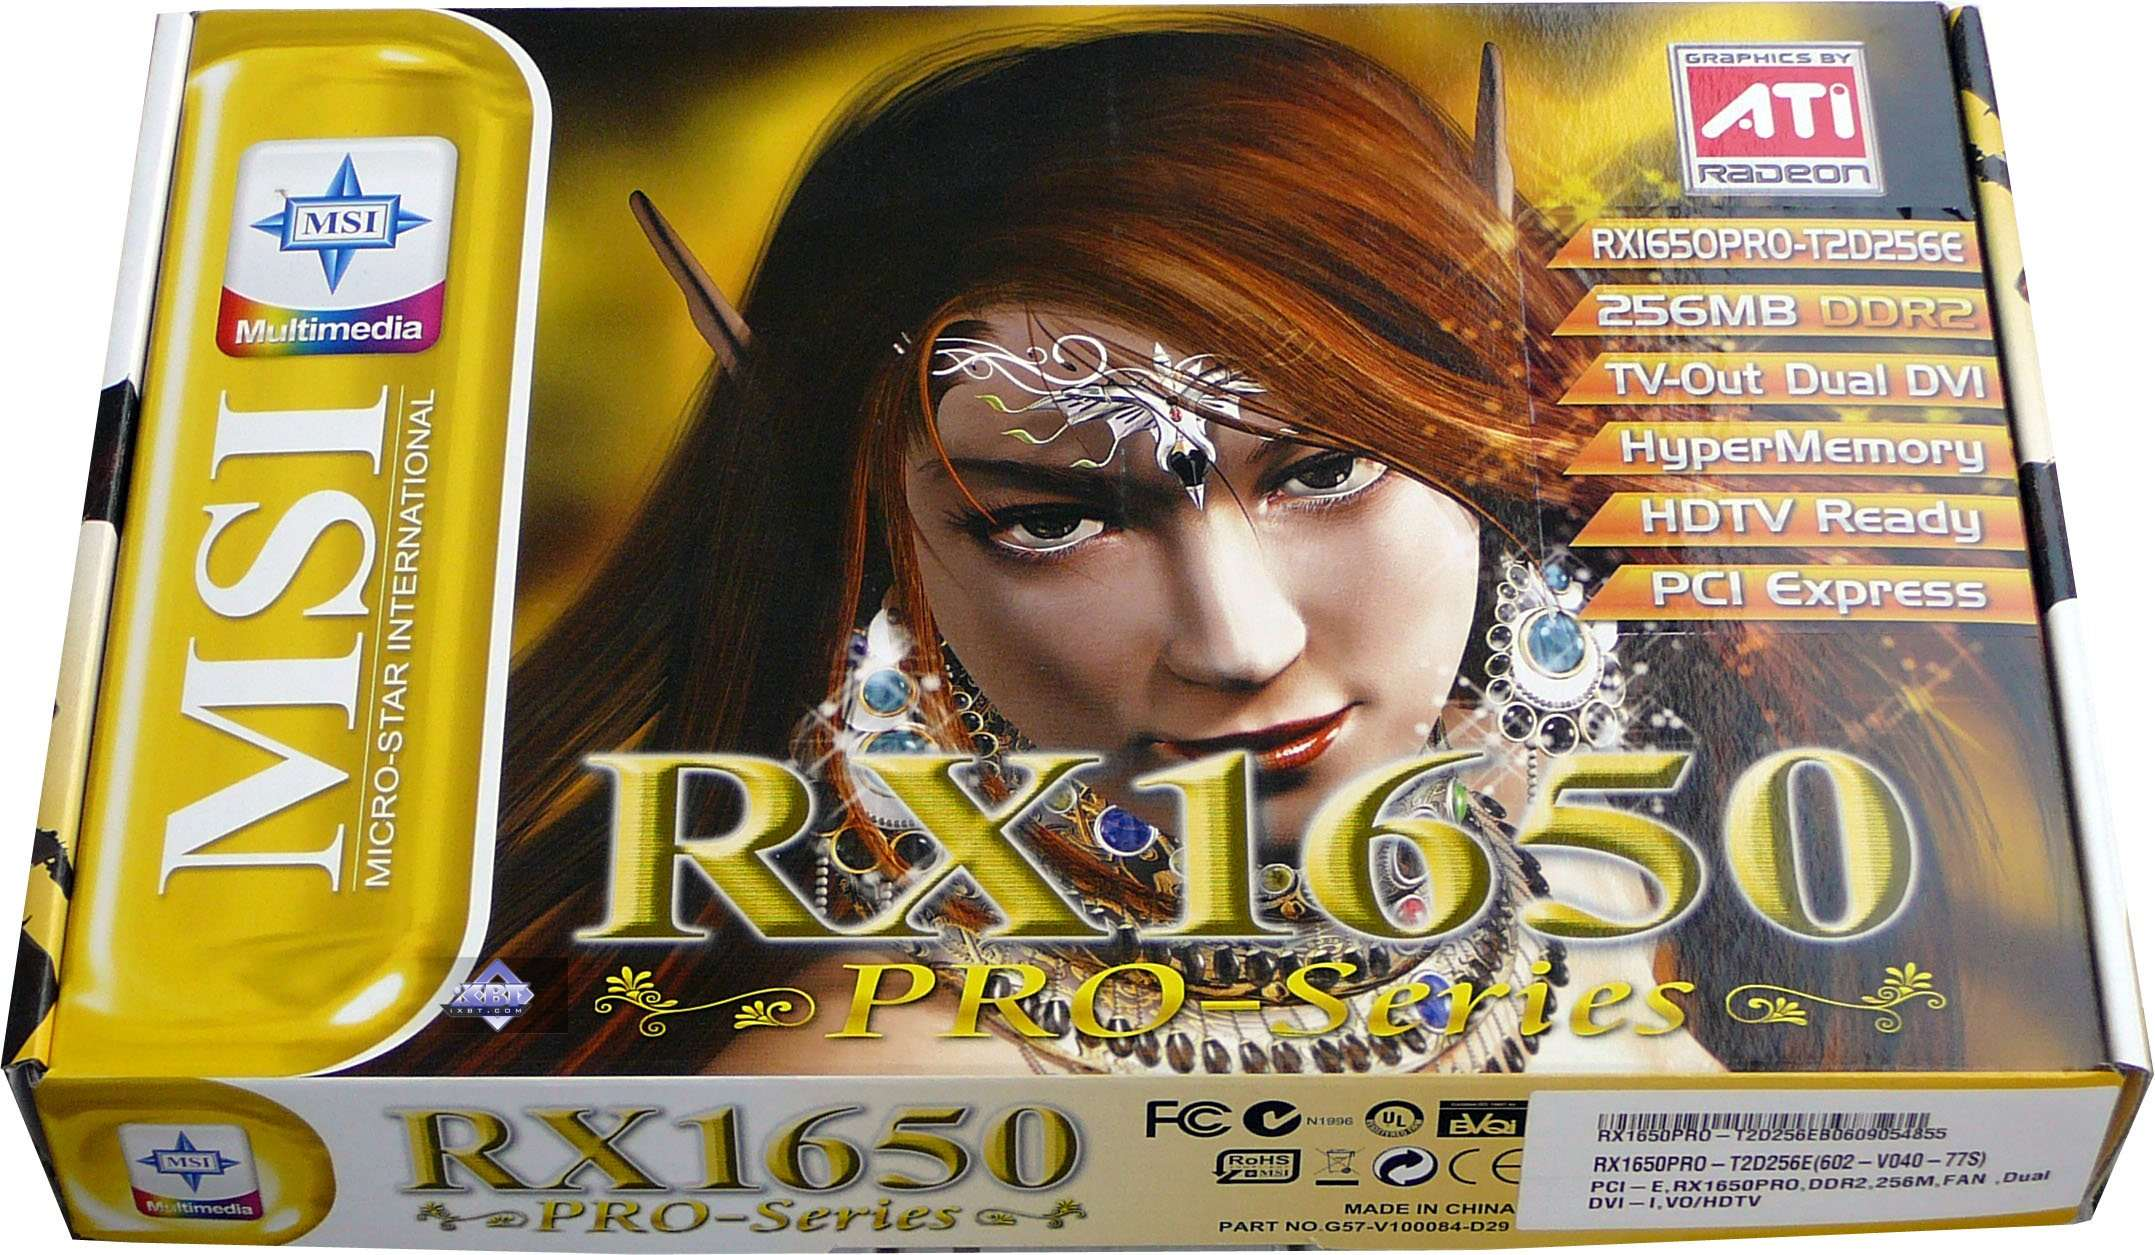 MSI RX1300PRO-TD256E - graphics card - Radeon X1300 Pro - 256 MB Specs